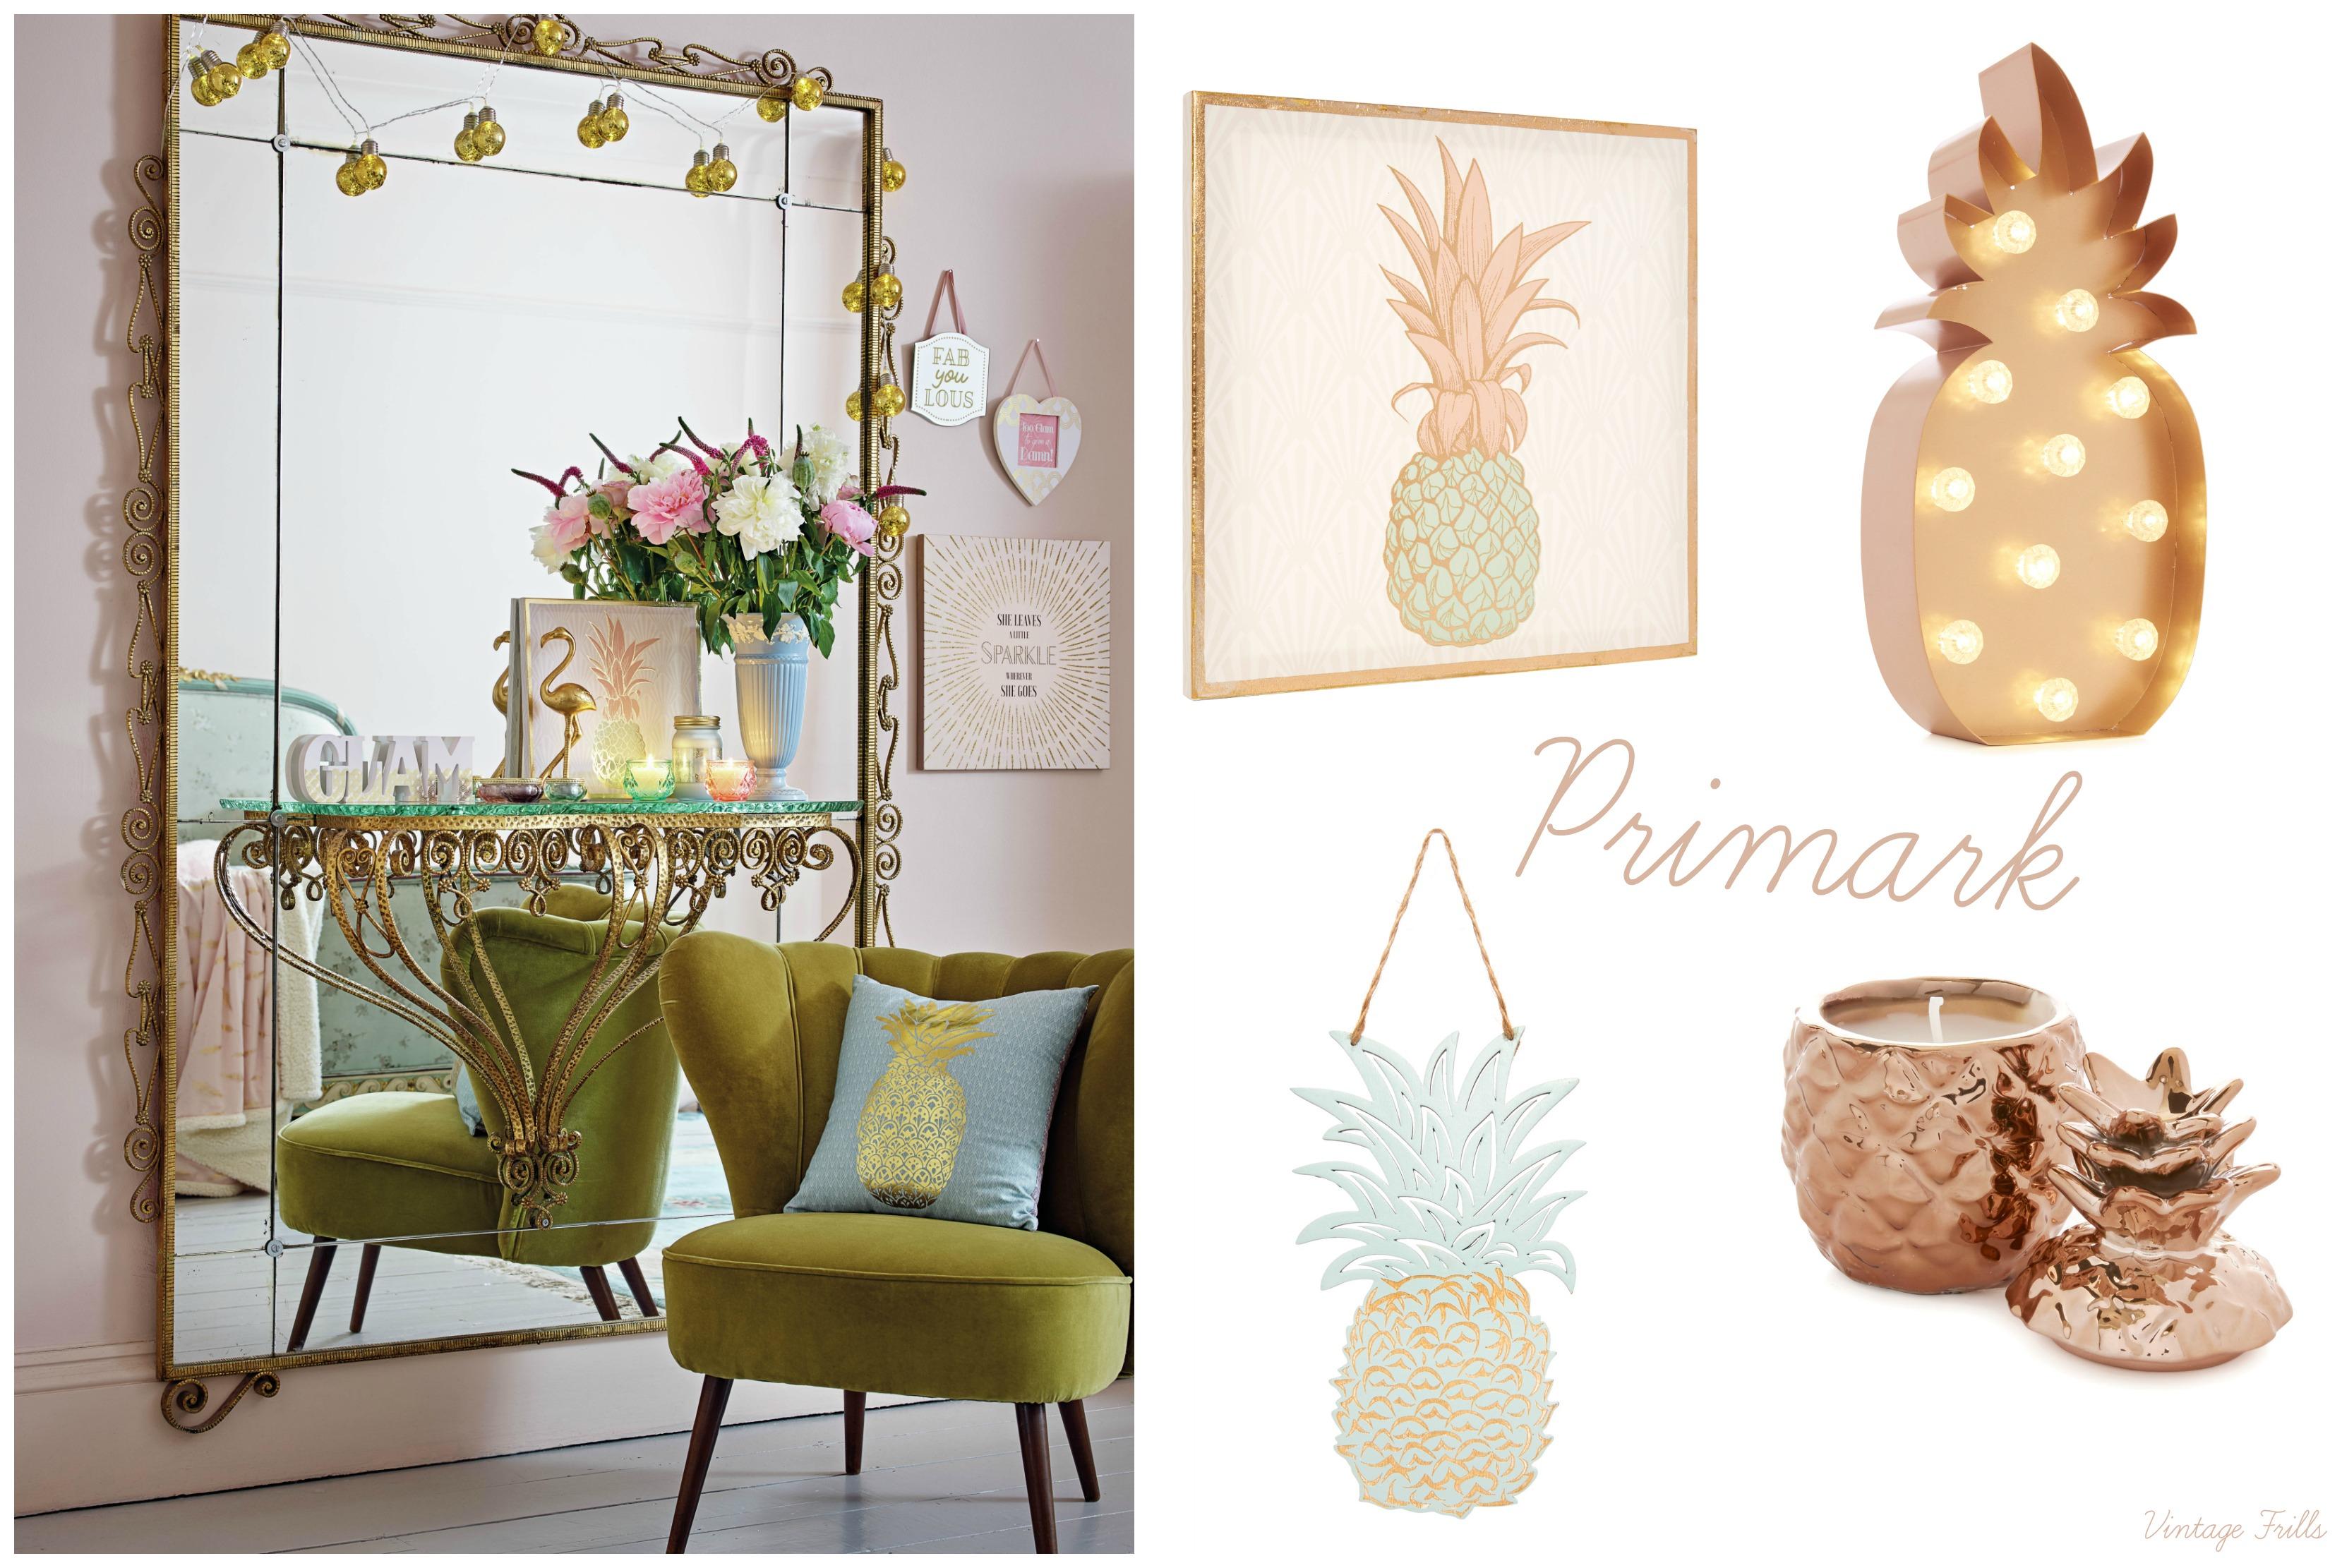 primark-pineapples